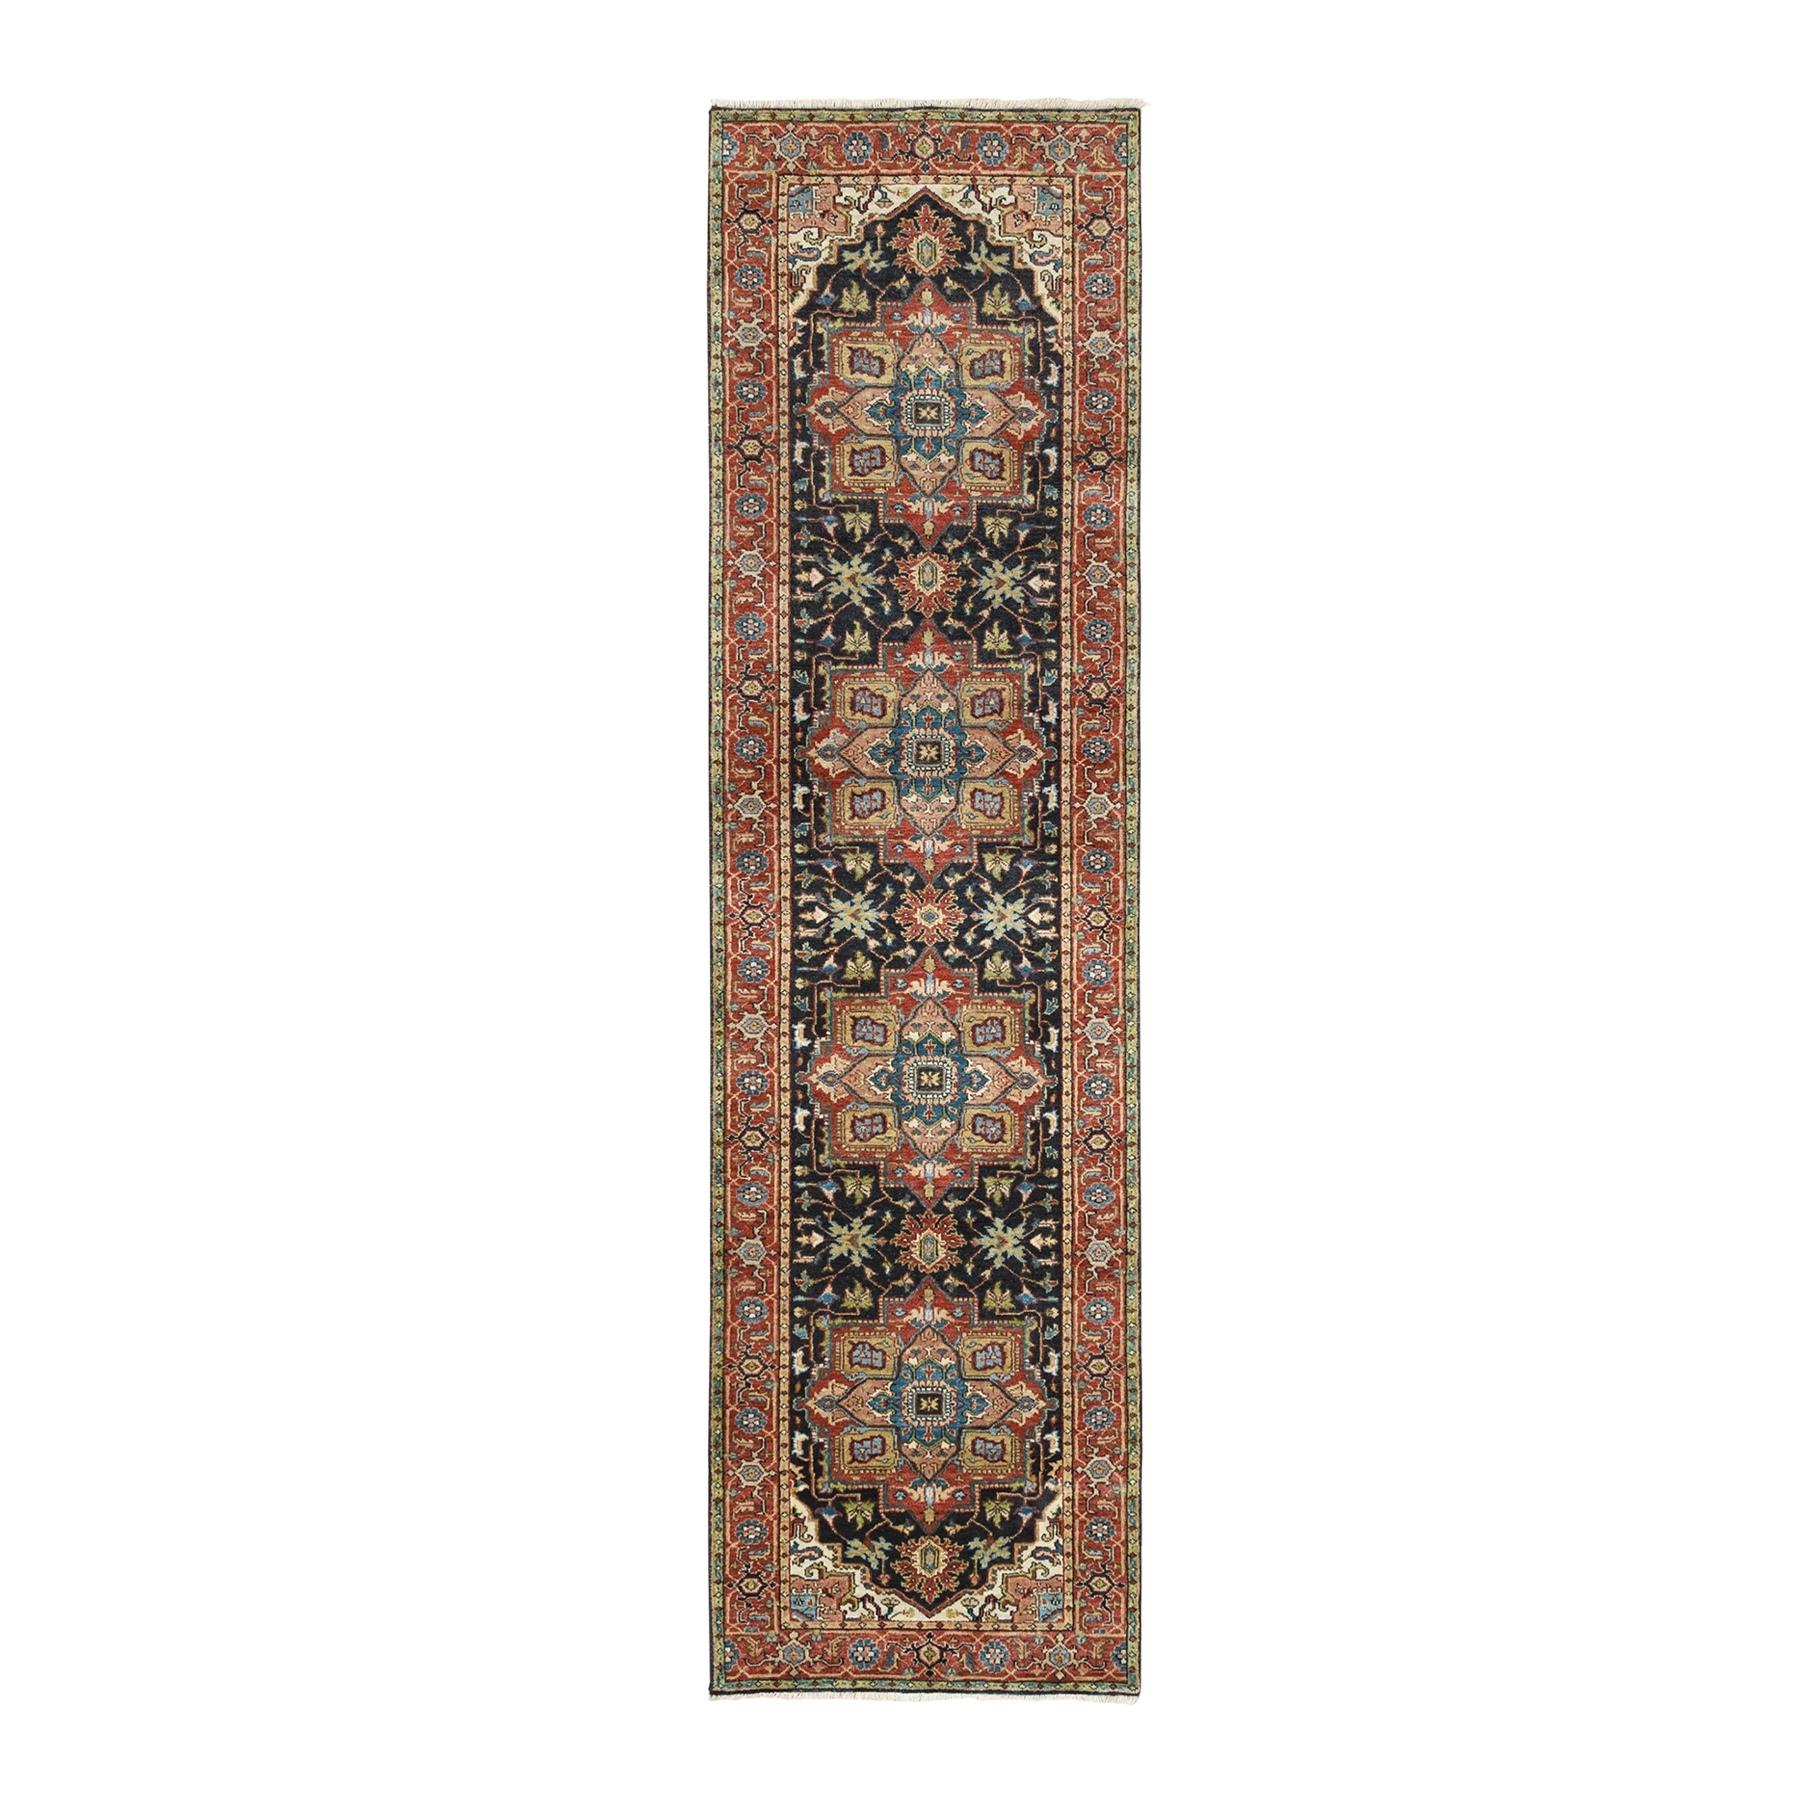 Serapi Heriz and Bakhshayesh Collection Hand Knotted Black Rug No: 1125942